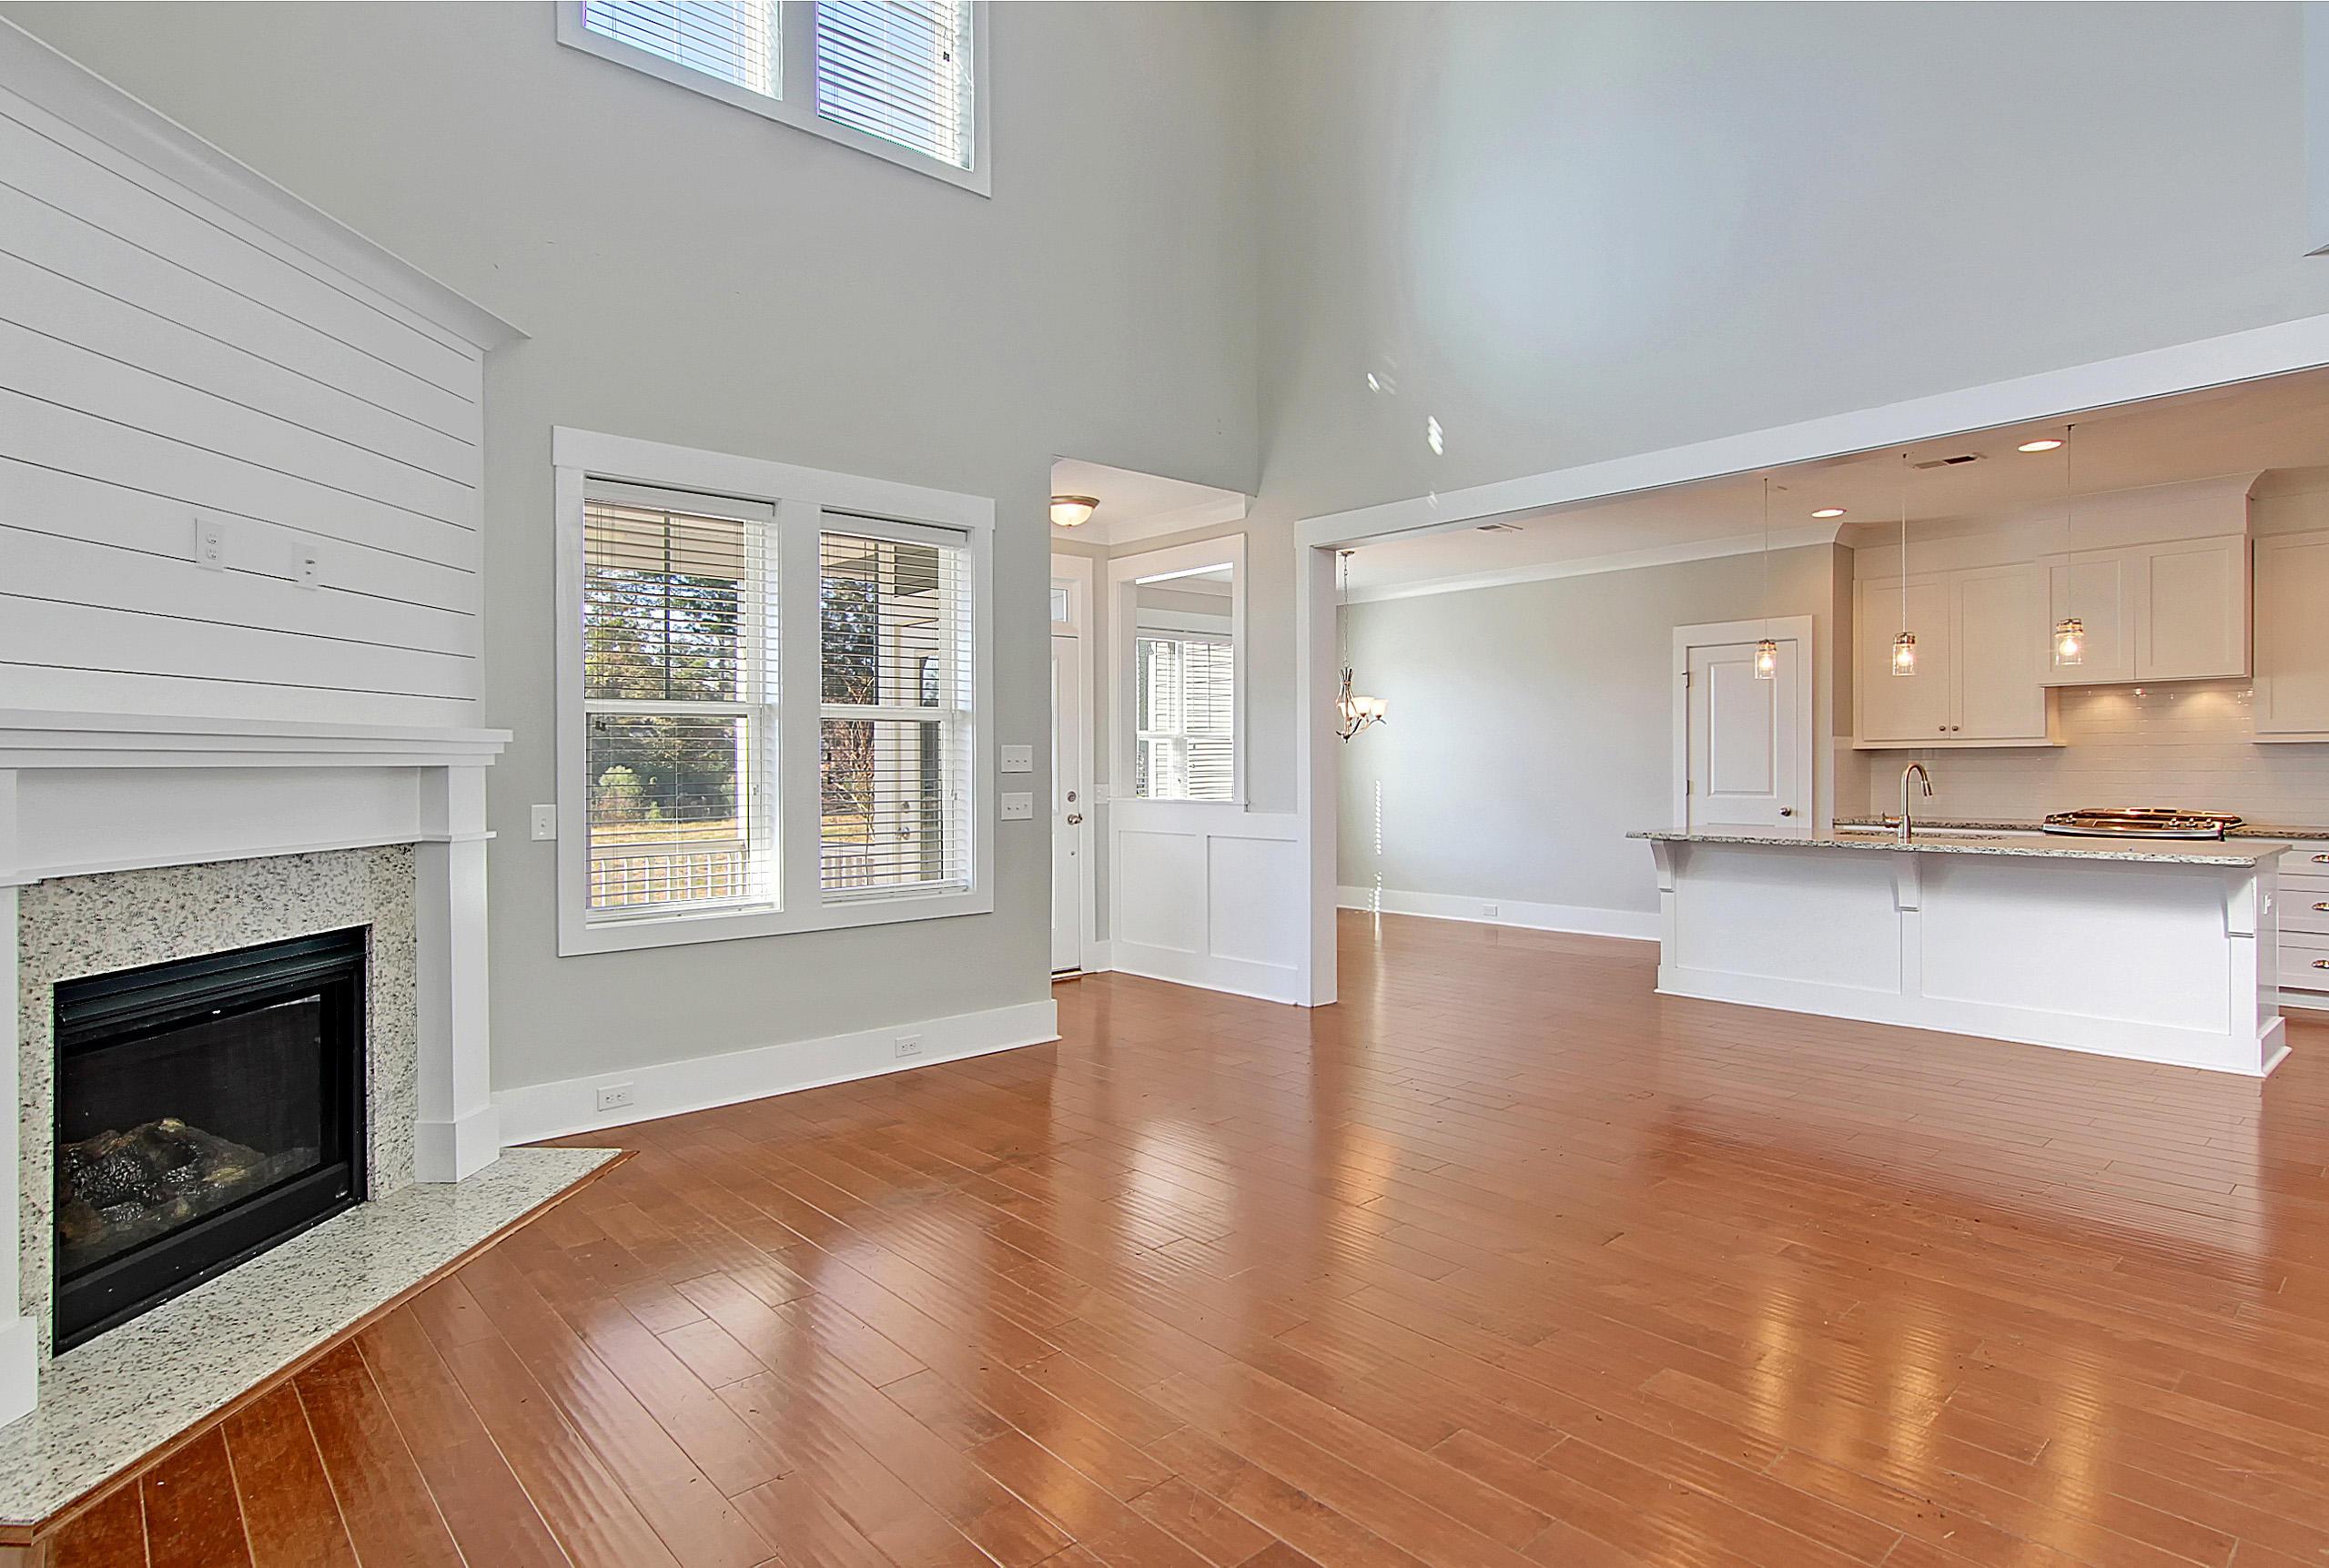 Crowfield Plantation Homes For Sale - 422 Hamlet, Goose Creek, SC - 0